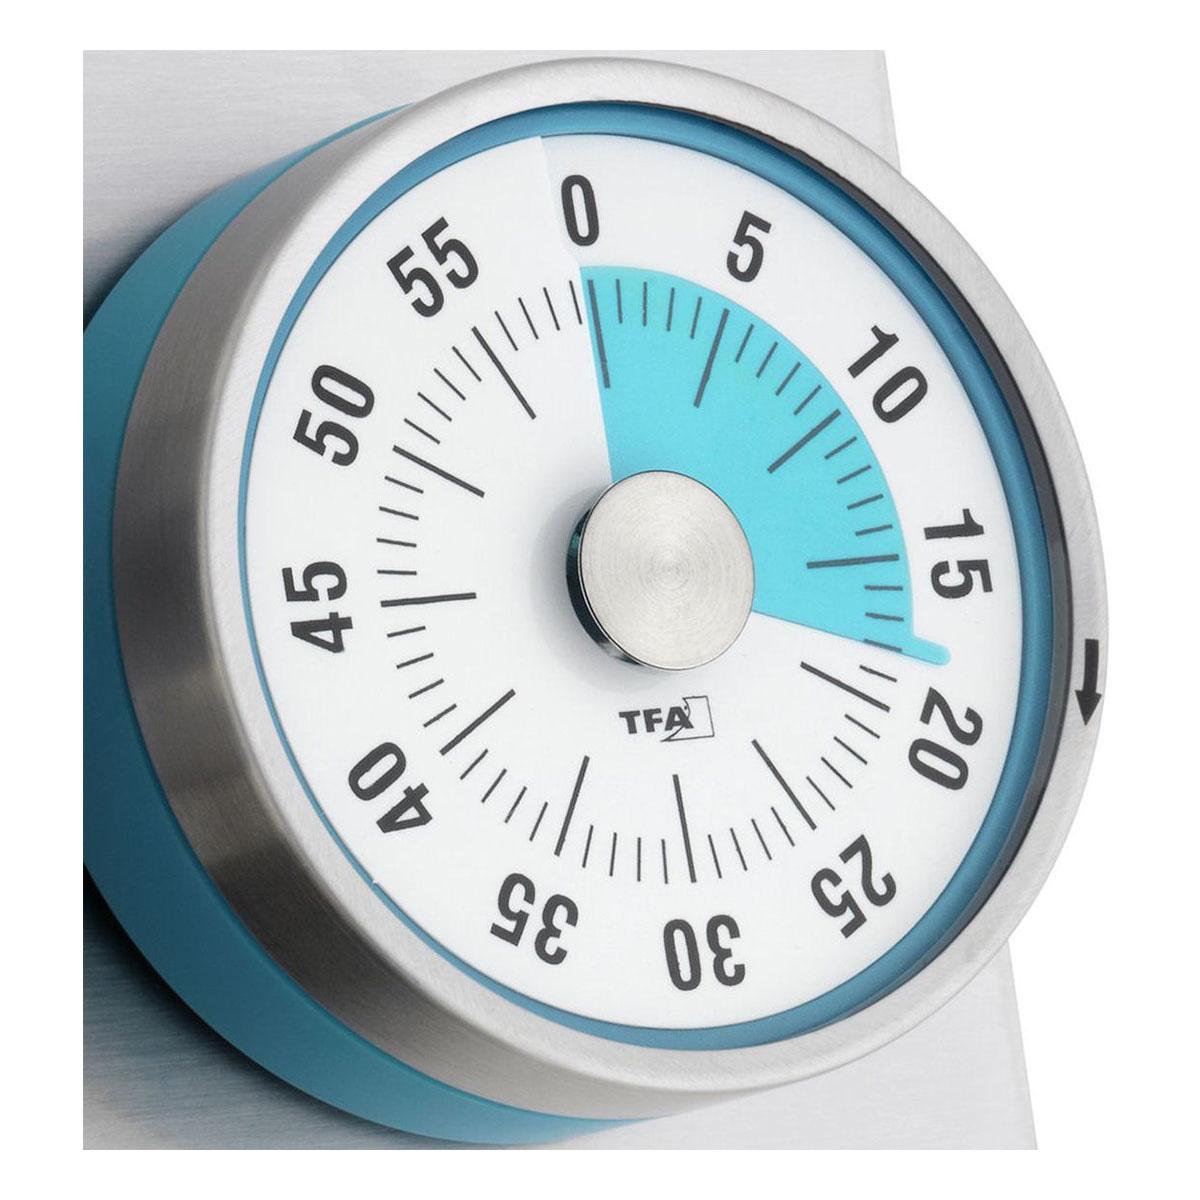 38-1028-20-analoger-küchen-timer-puck-anwendung-1200x1200px.jpg